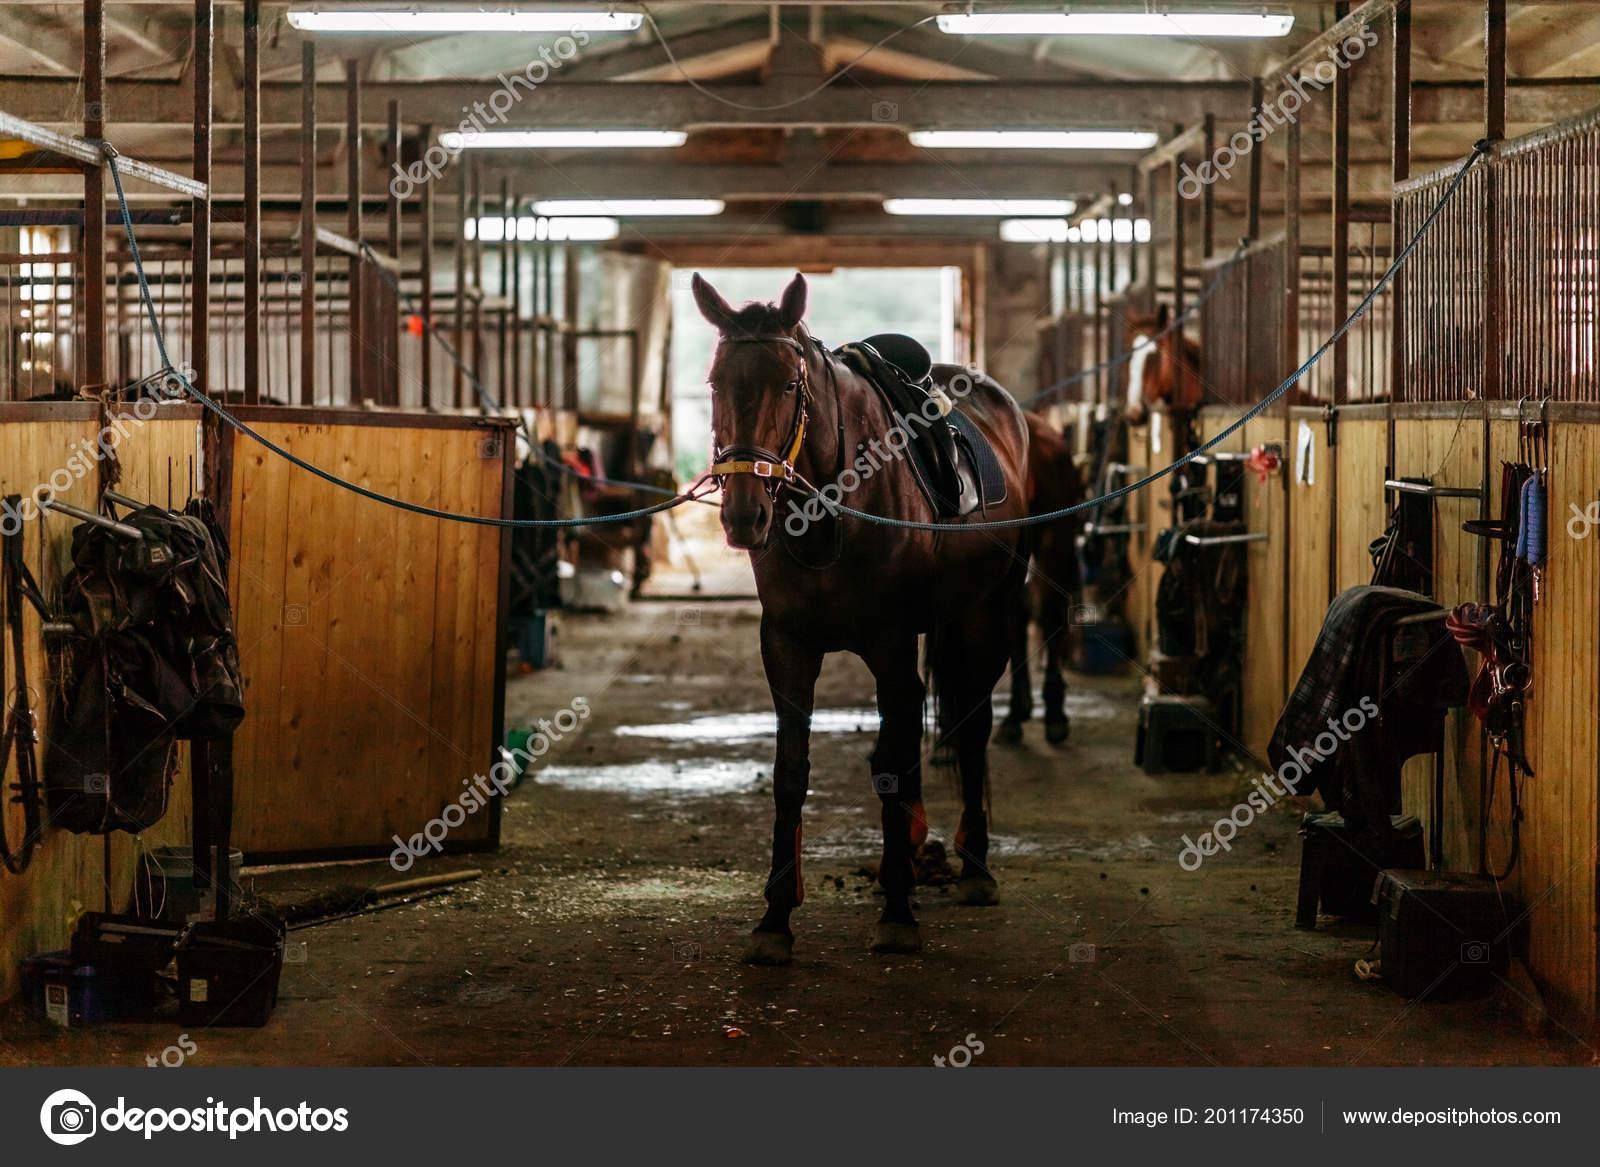 Beautiful Horses Animals Pasture Stables Horseback Riding Stock Photo C Vitizh 201174350